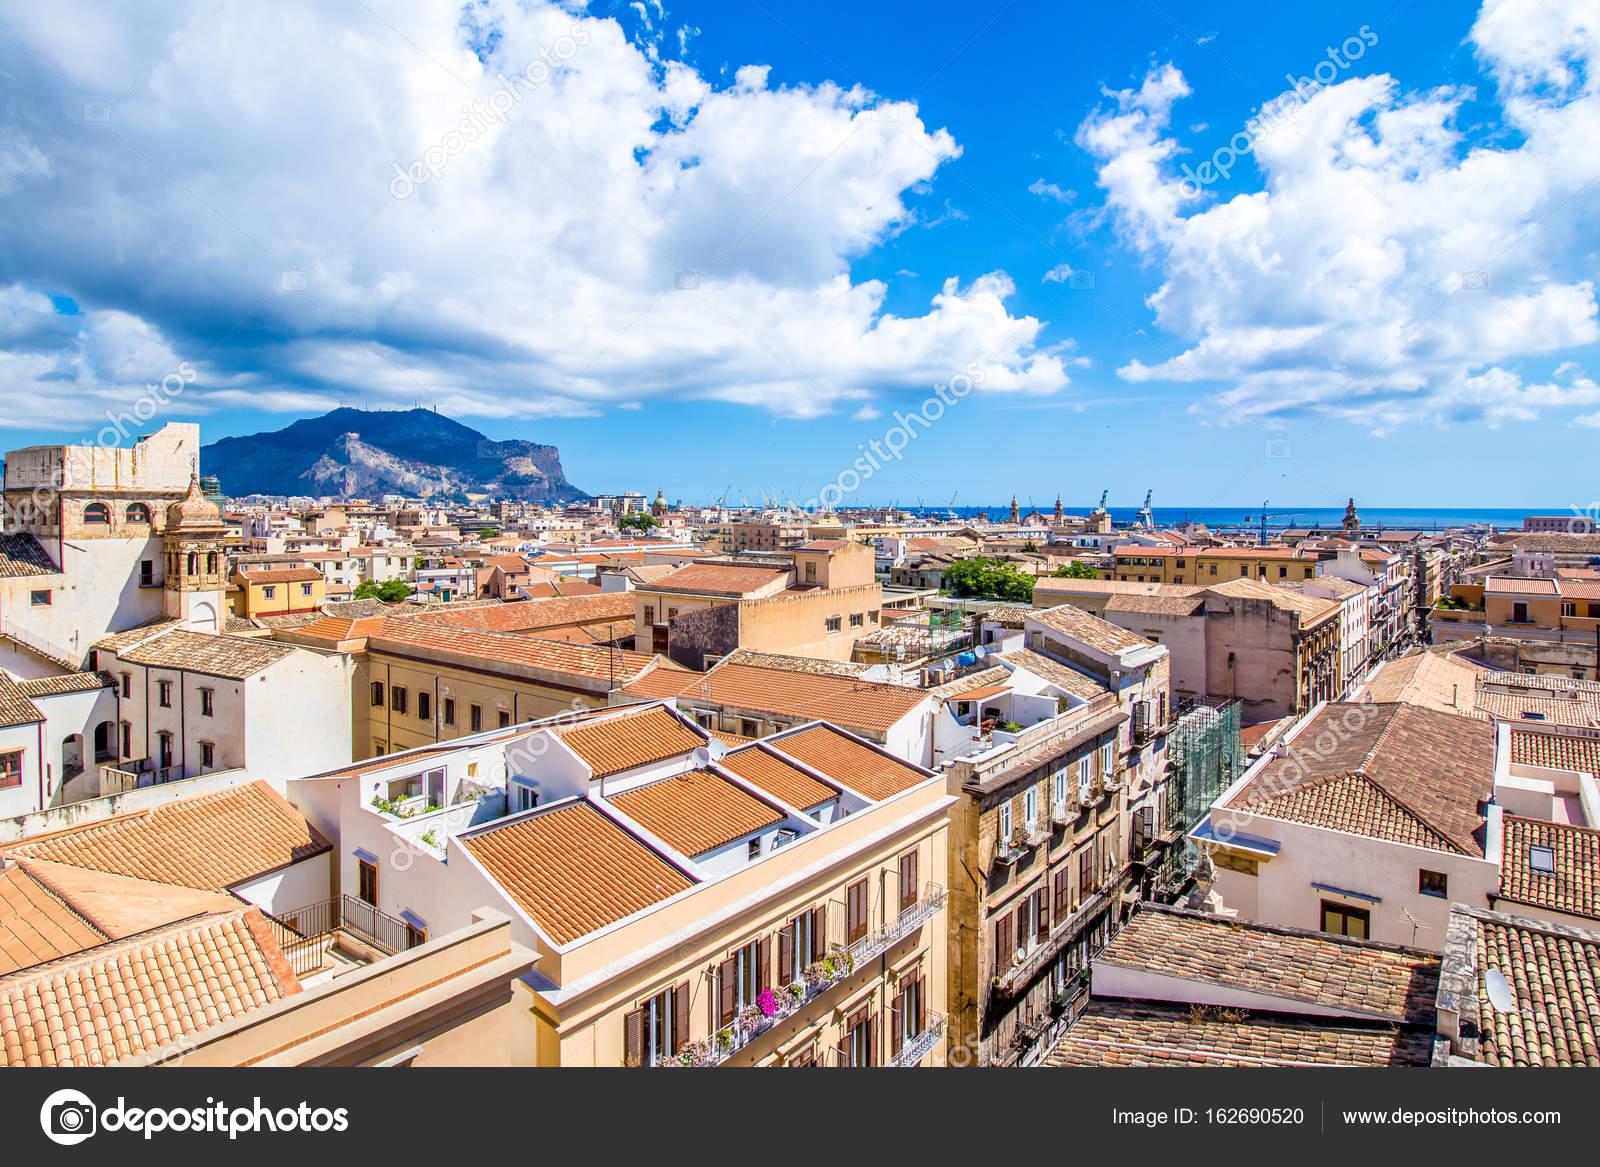 Fotos da cidade de palermo na italia 23